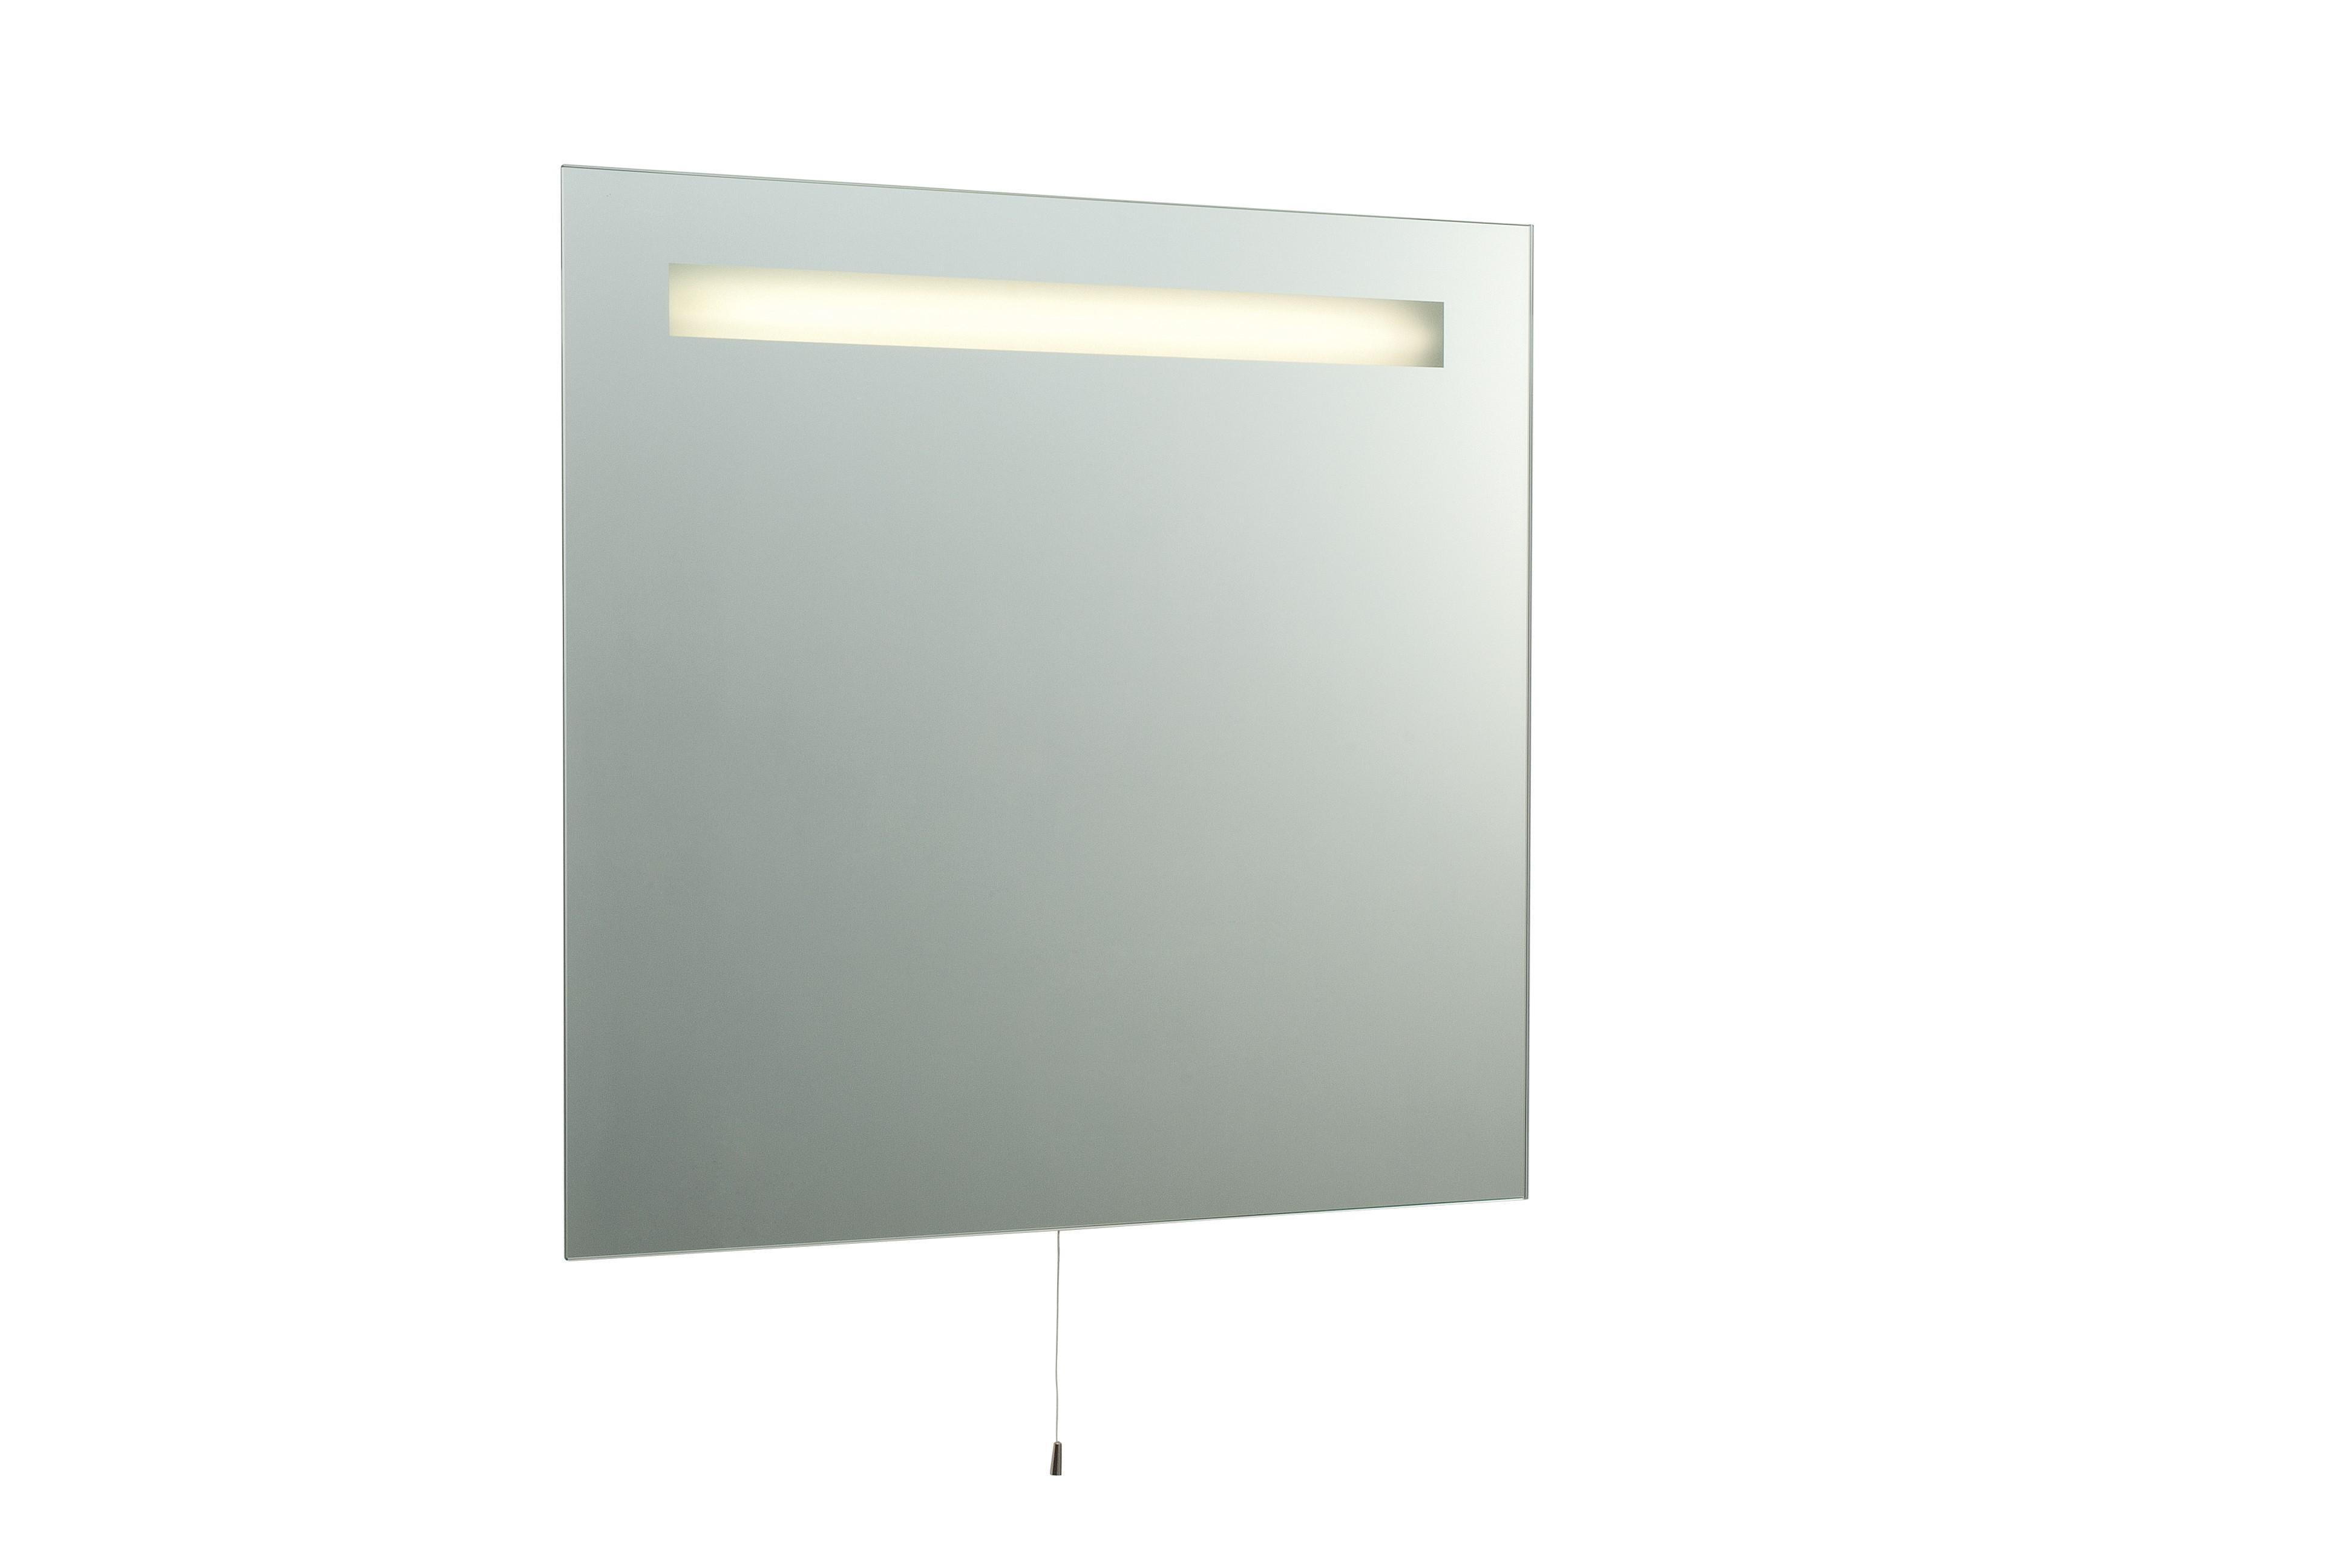 Eclairage pour miroir de salle de bain accessoire salle de bain